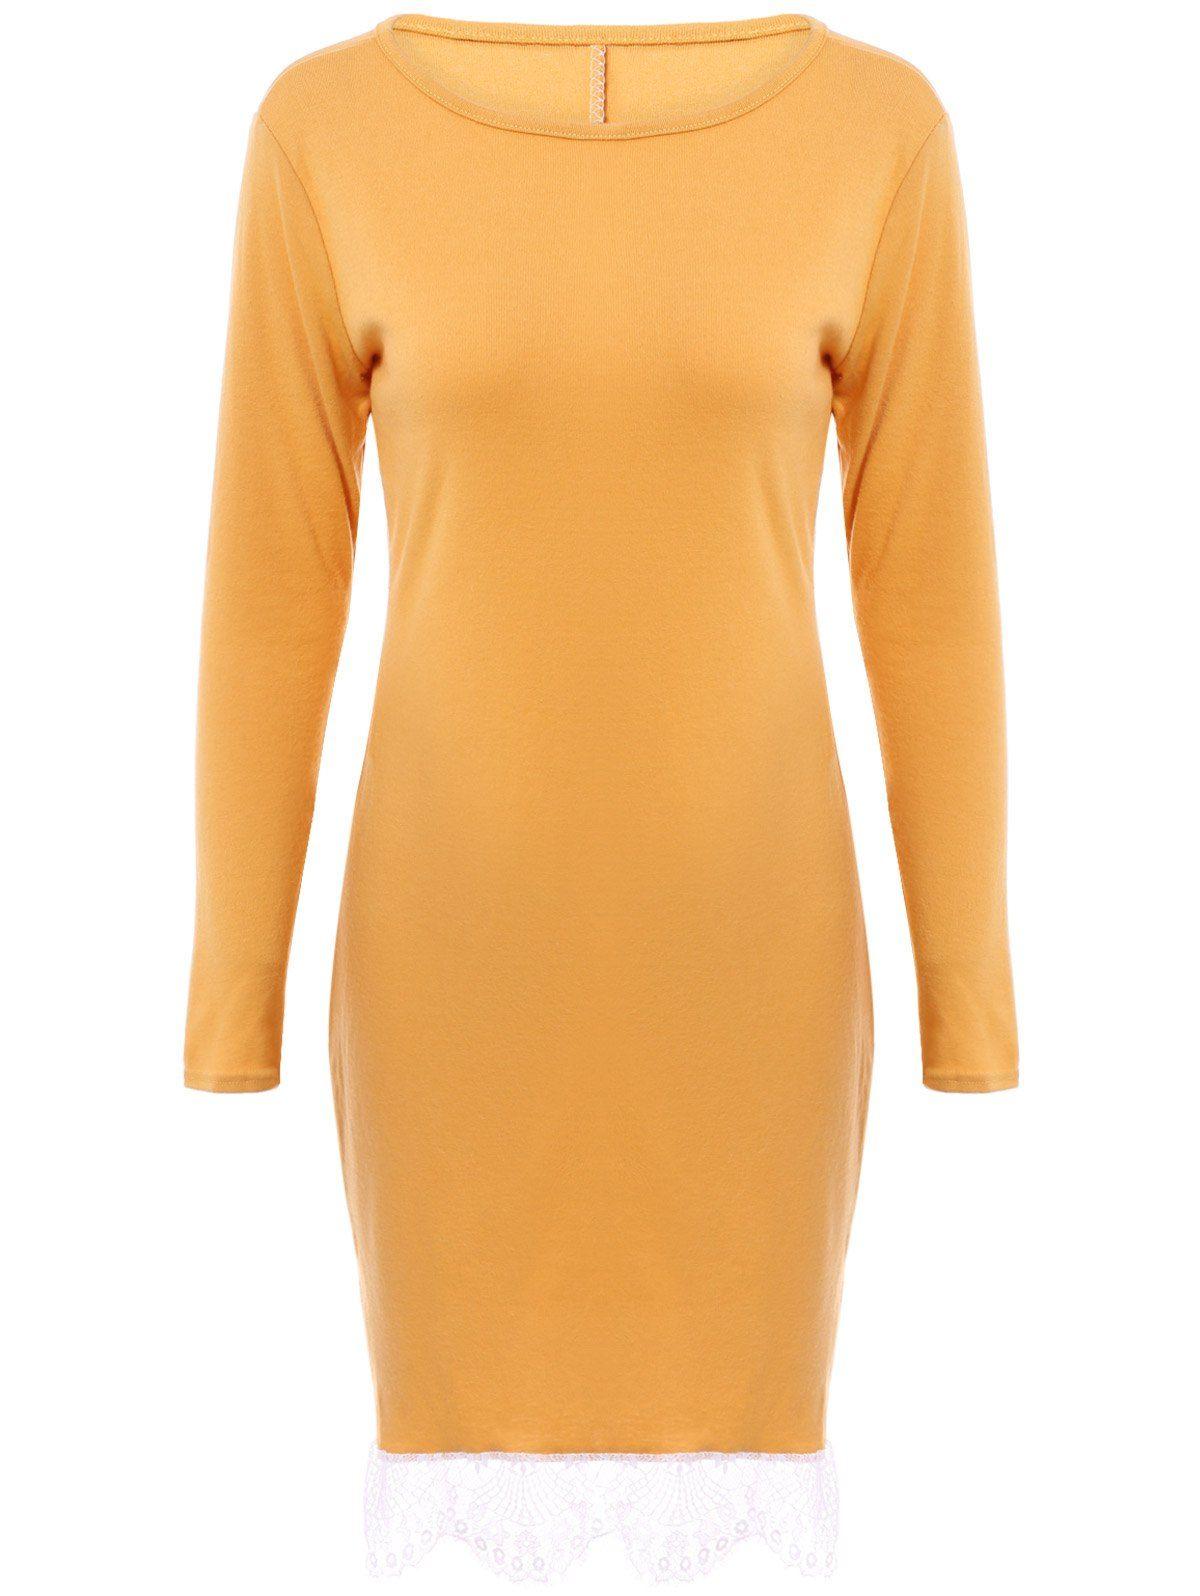 Elegant womenus round collar laced long sleeve dress sleeved dress